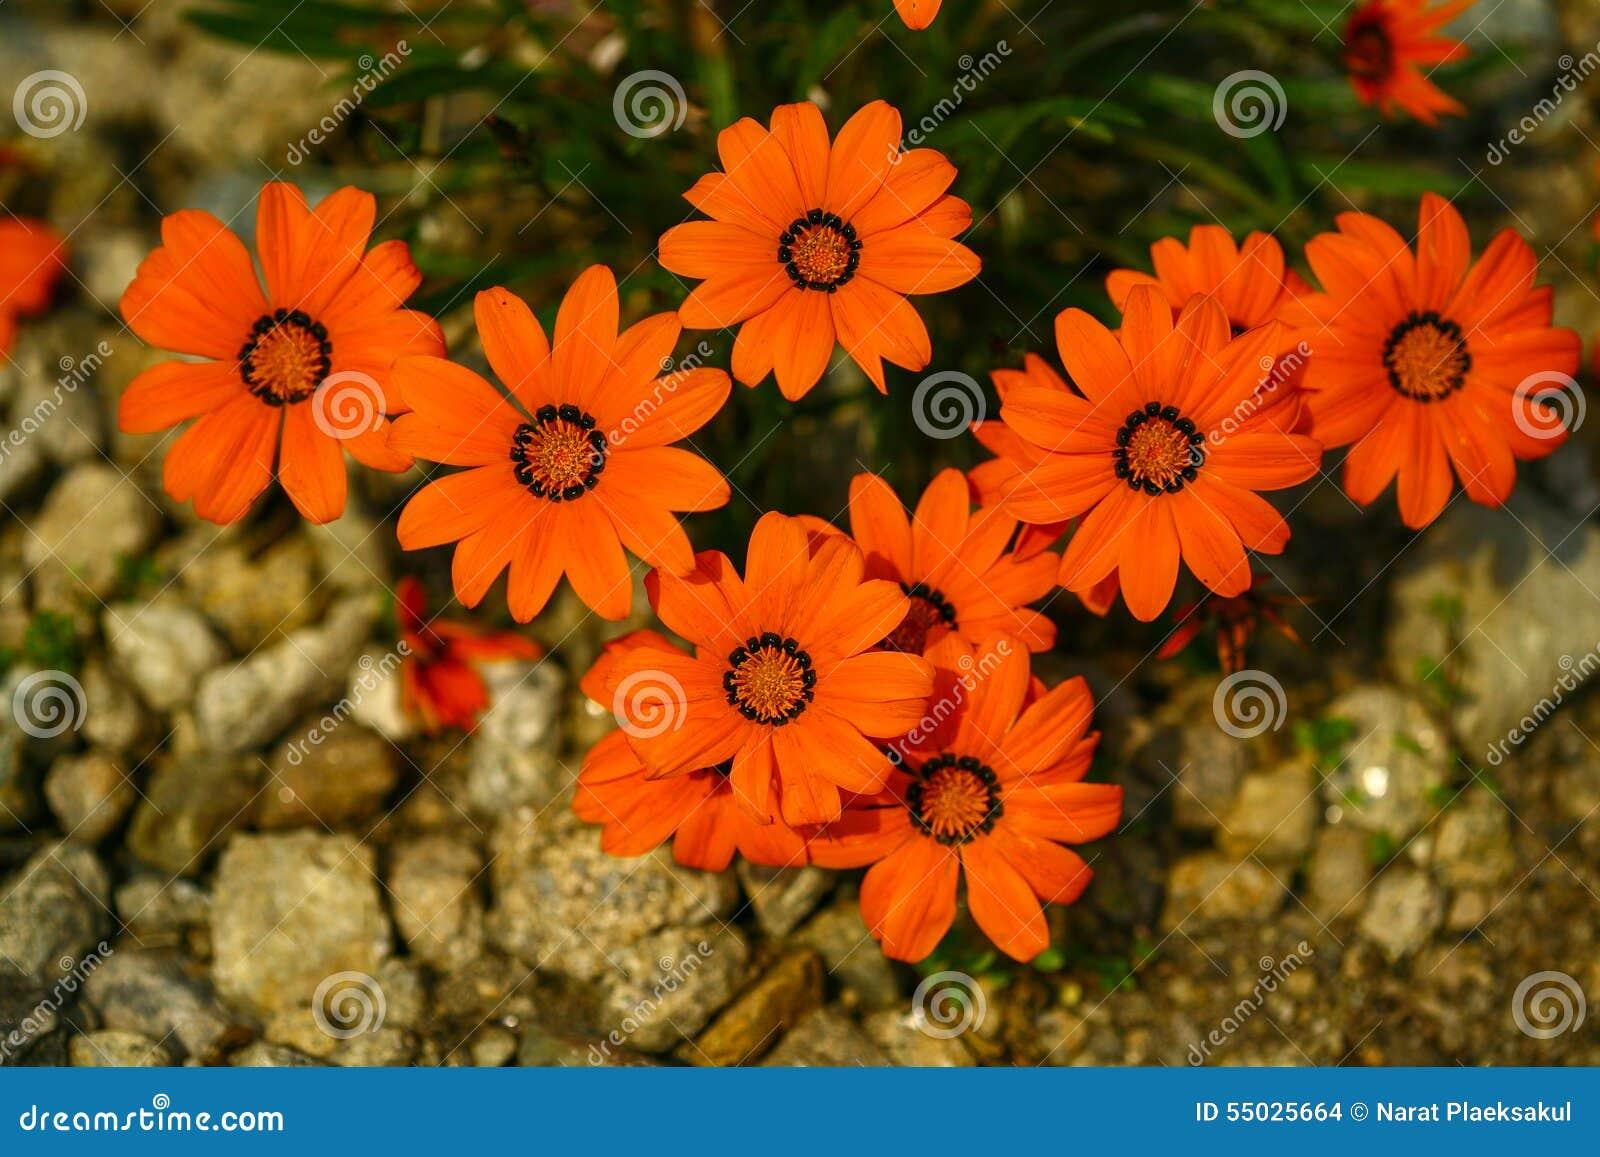 Flowers that look like daisies painted daisy carinatum gerbera daisy like flower stock photos images izmirmasajfo